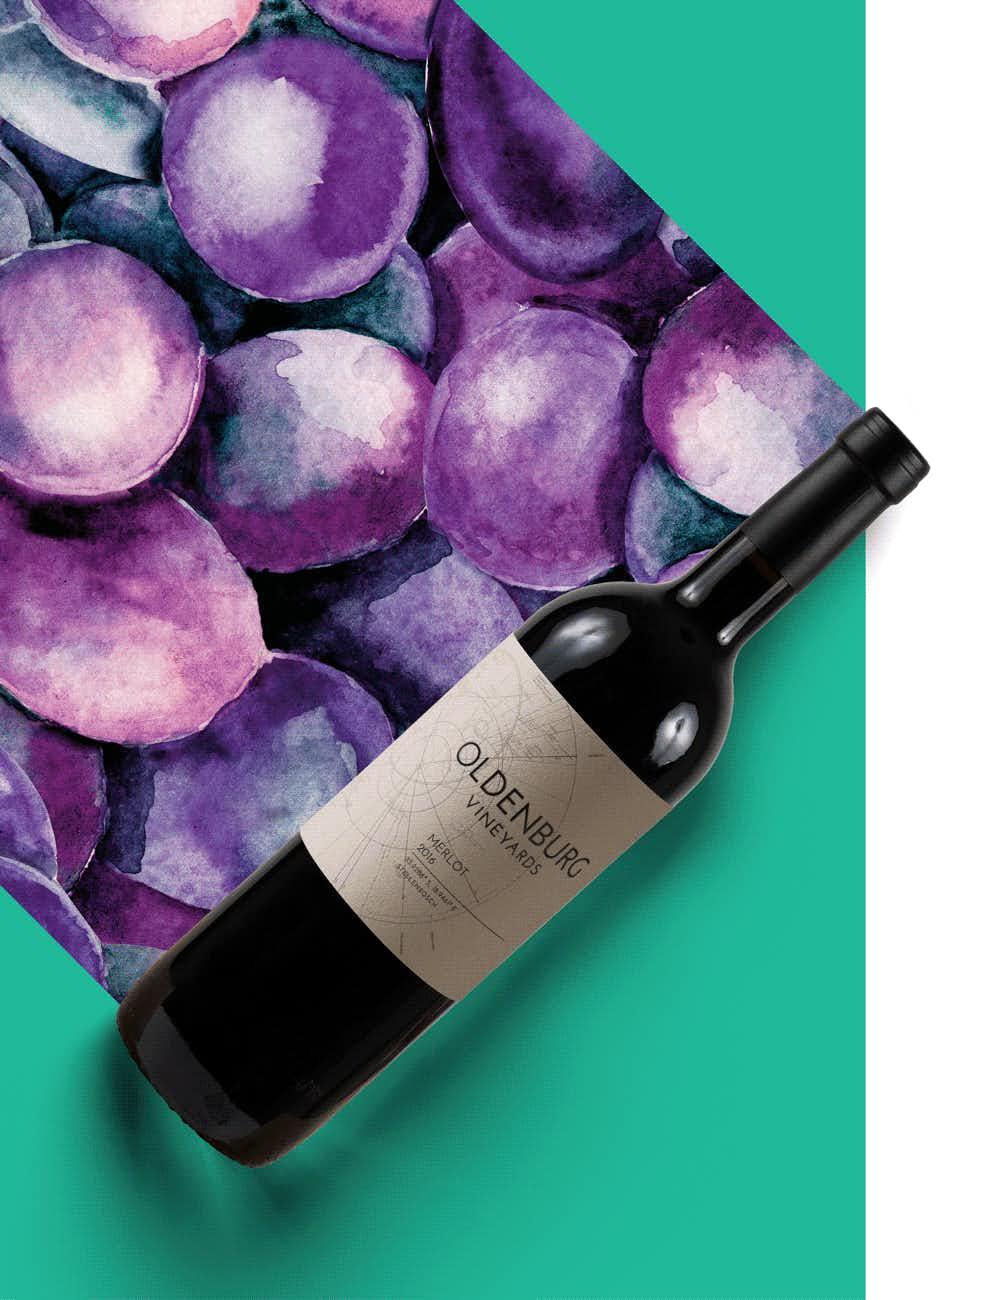 Oldenburg Vineyards Merlot 2016